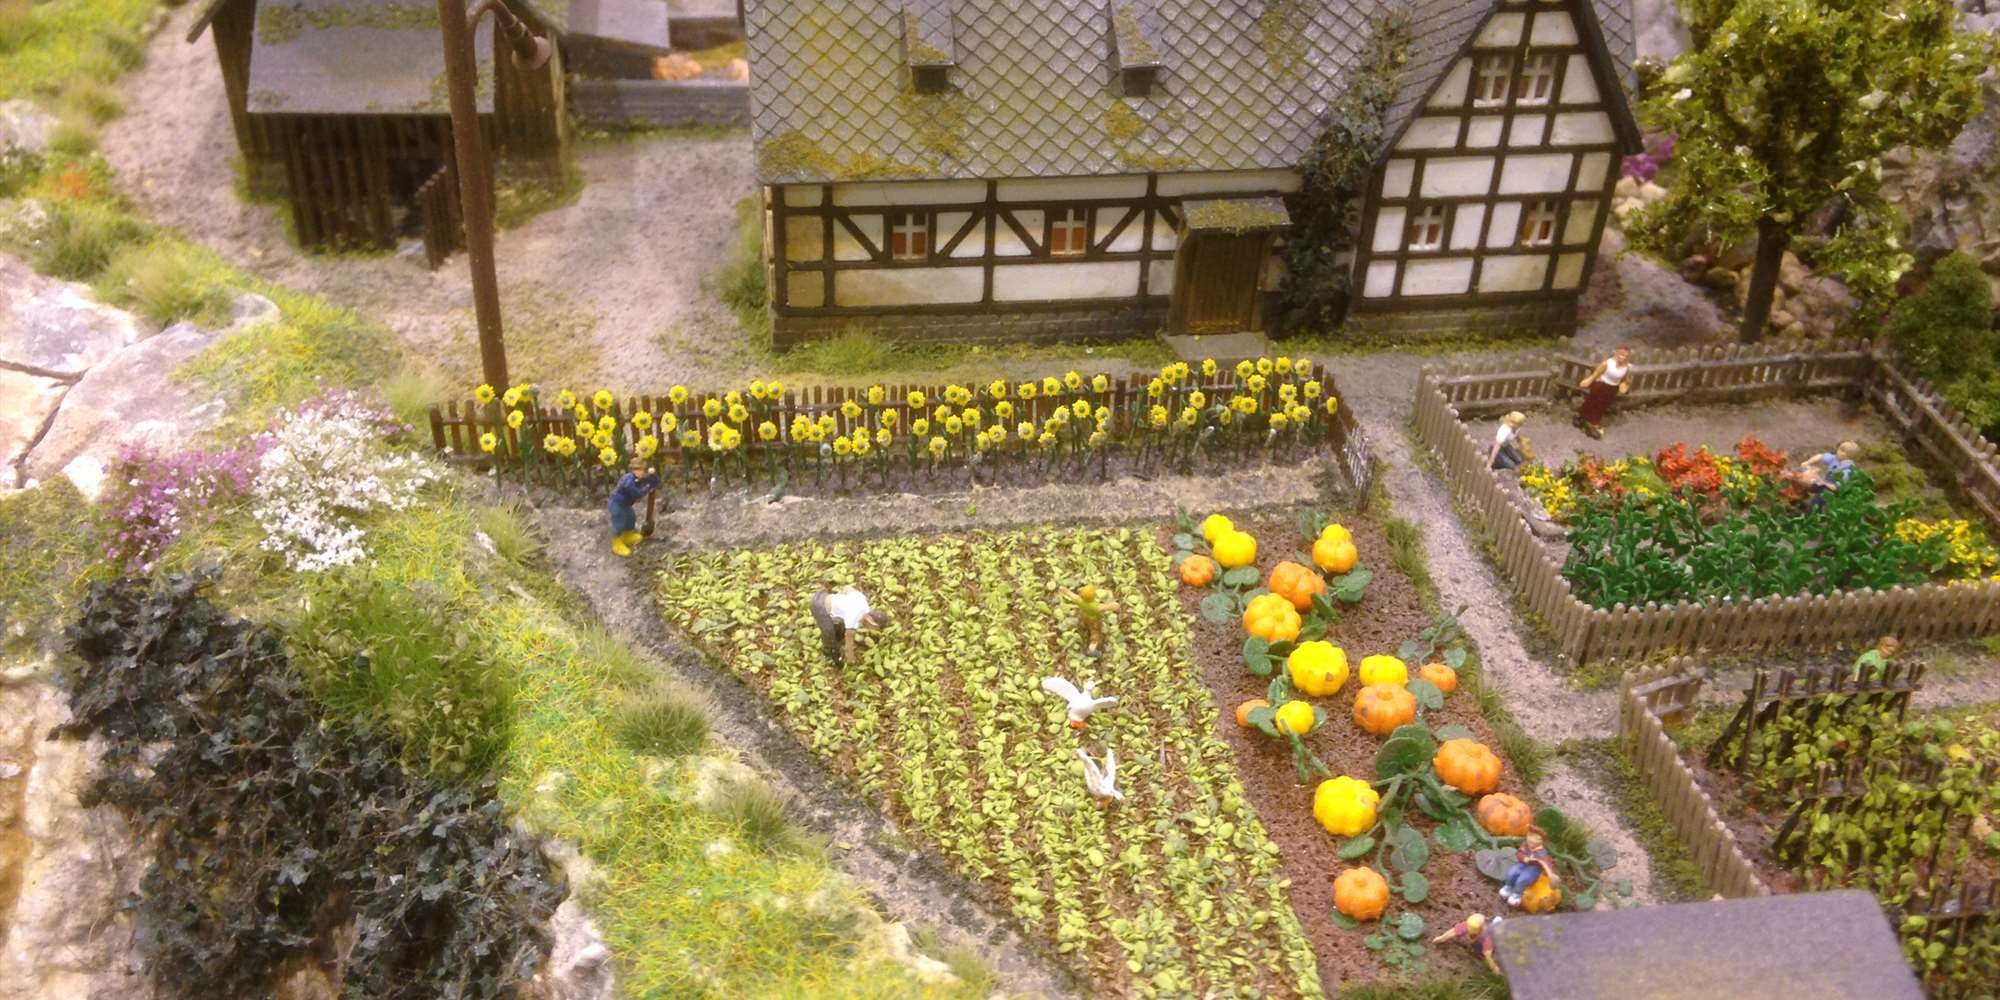 Miniature railway fair - visitBergen.com